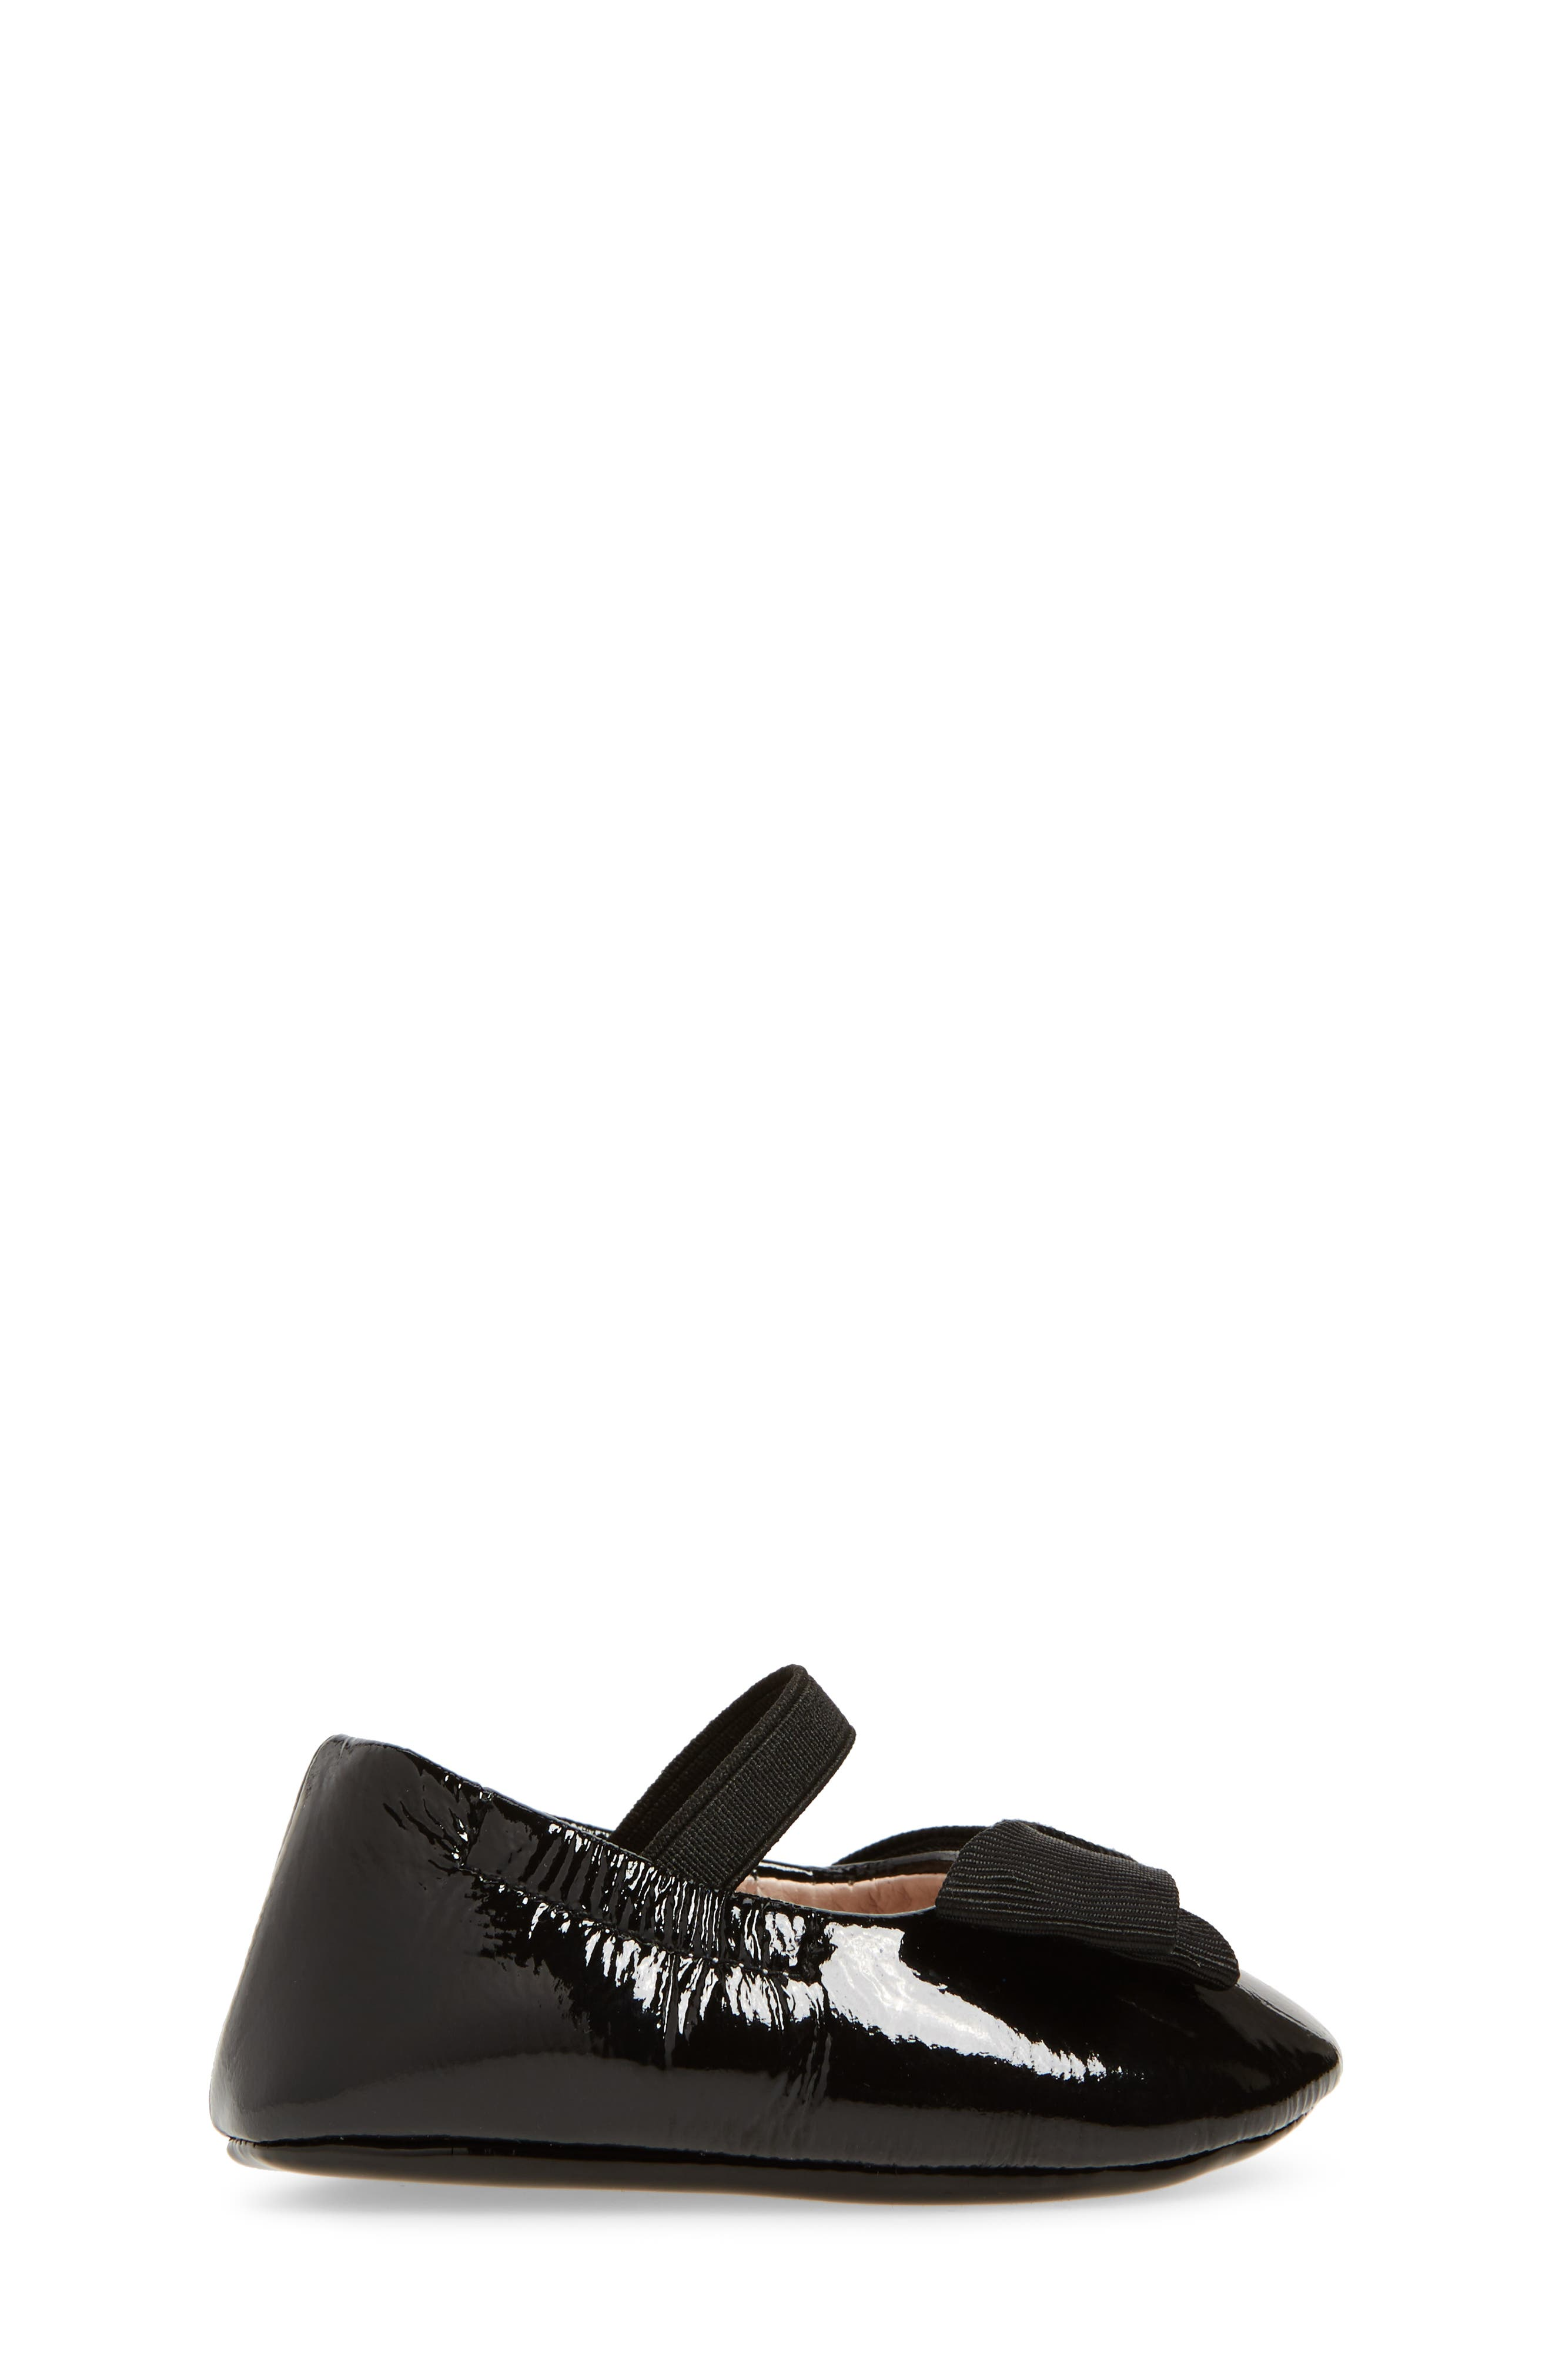 Lilia Mary Jane Flat,                             Alternate thumbnail 3, color,                             Black Patent Leather